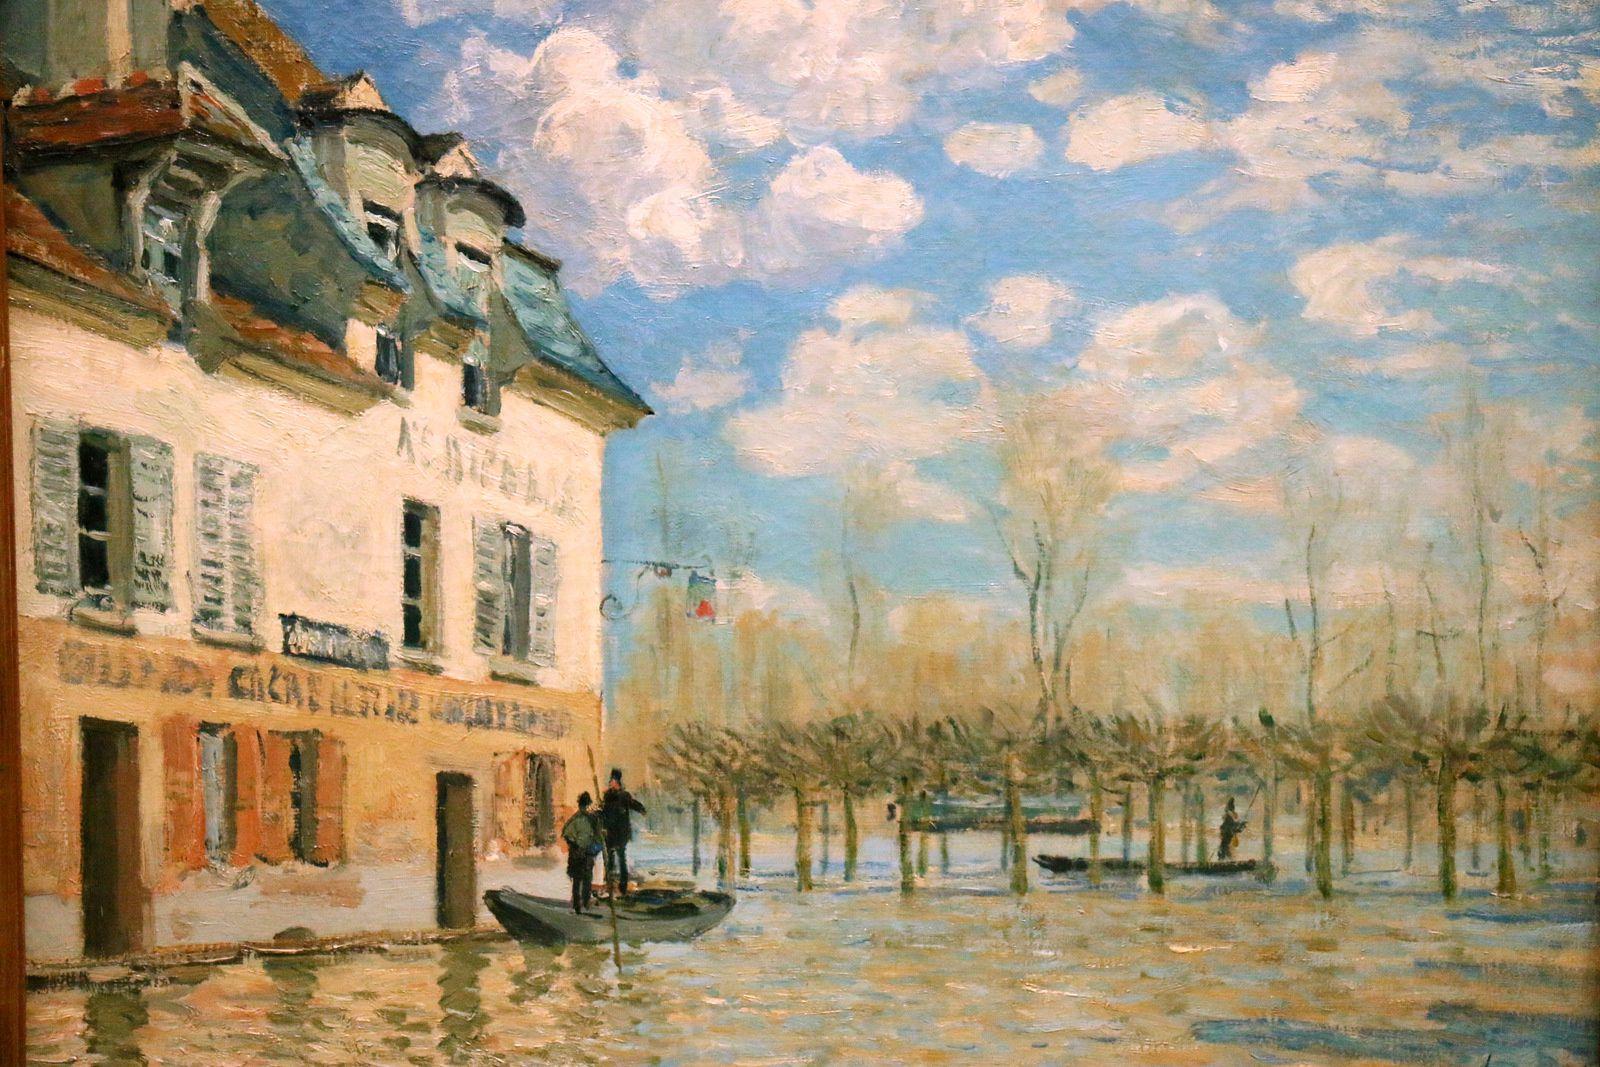 La barque pendant l'inondation, Port-Marly, huile sur toile d'Alfred Sisley